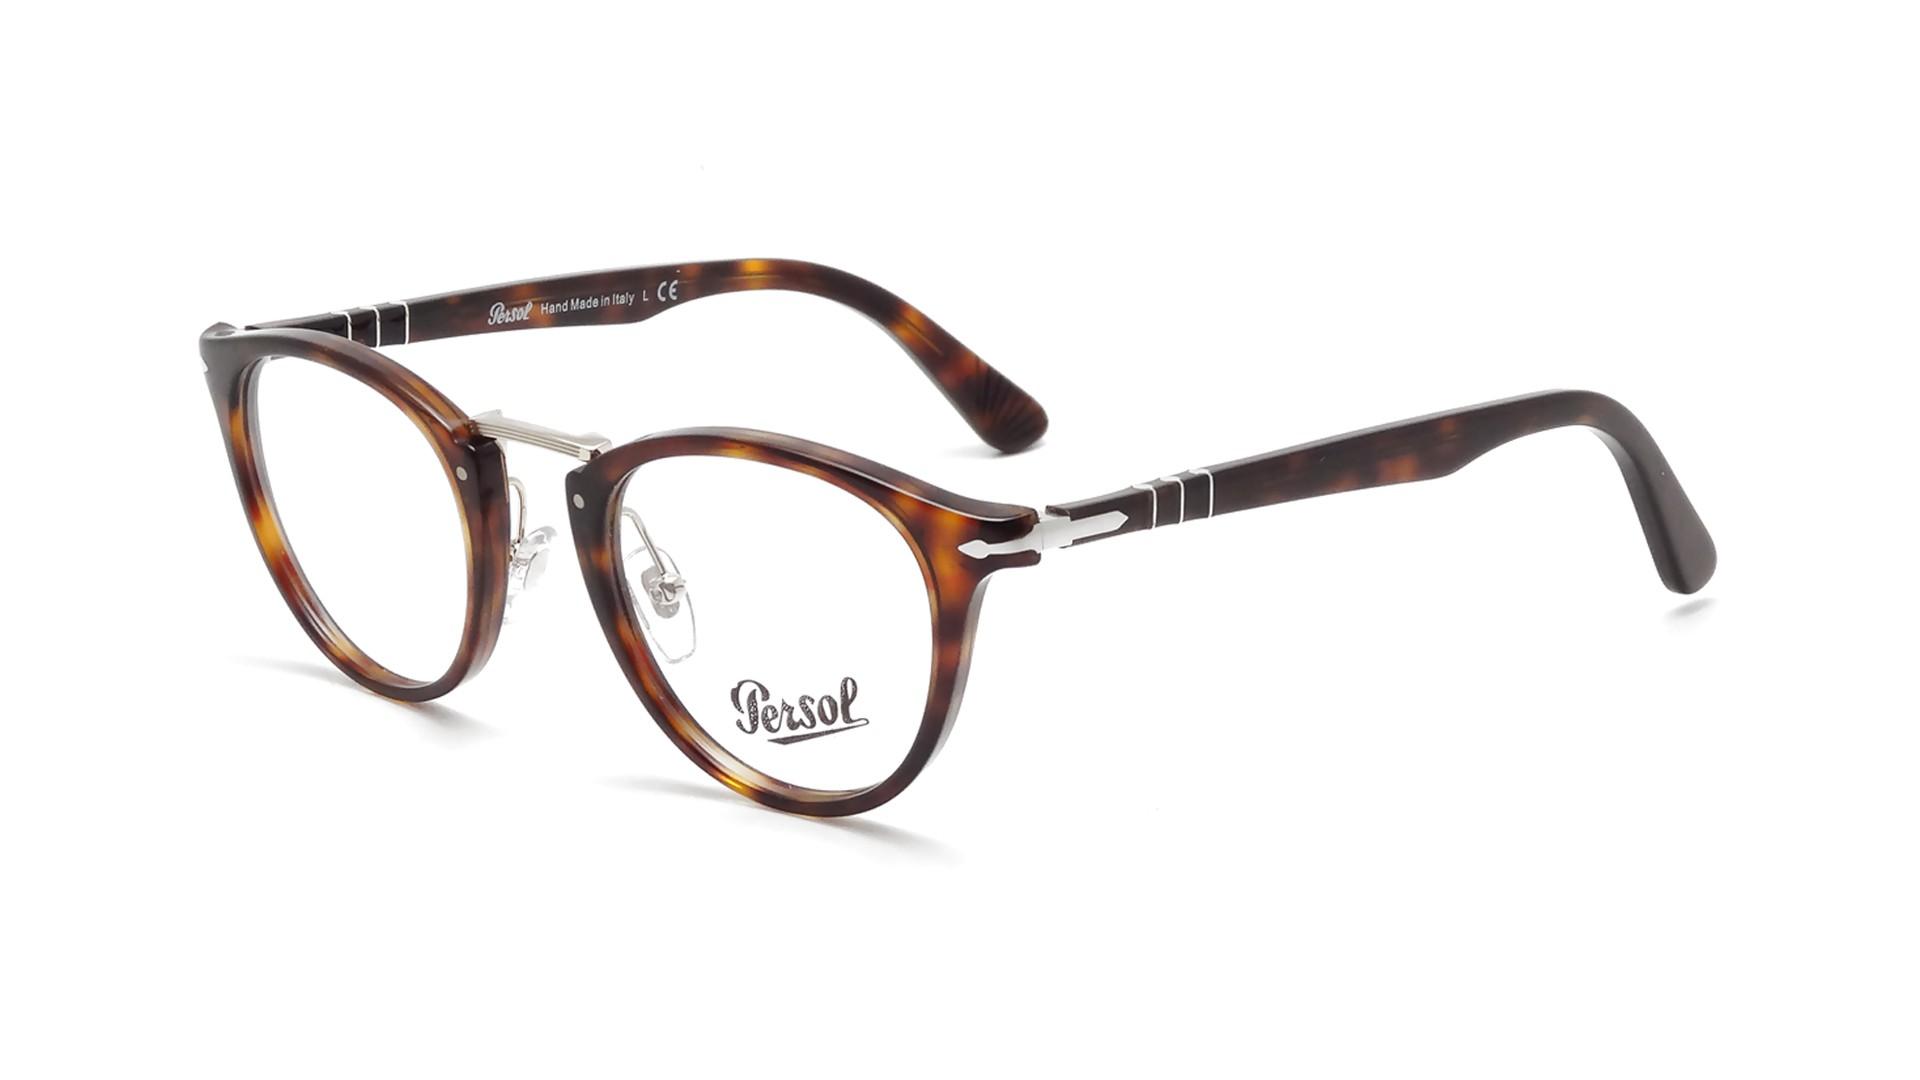 c66e0e2c9be Eyeglasses Persol Typewriter Edition Tortoise PO3107V 24 47-22 Small